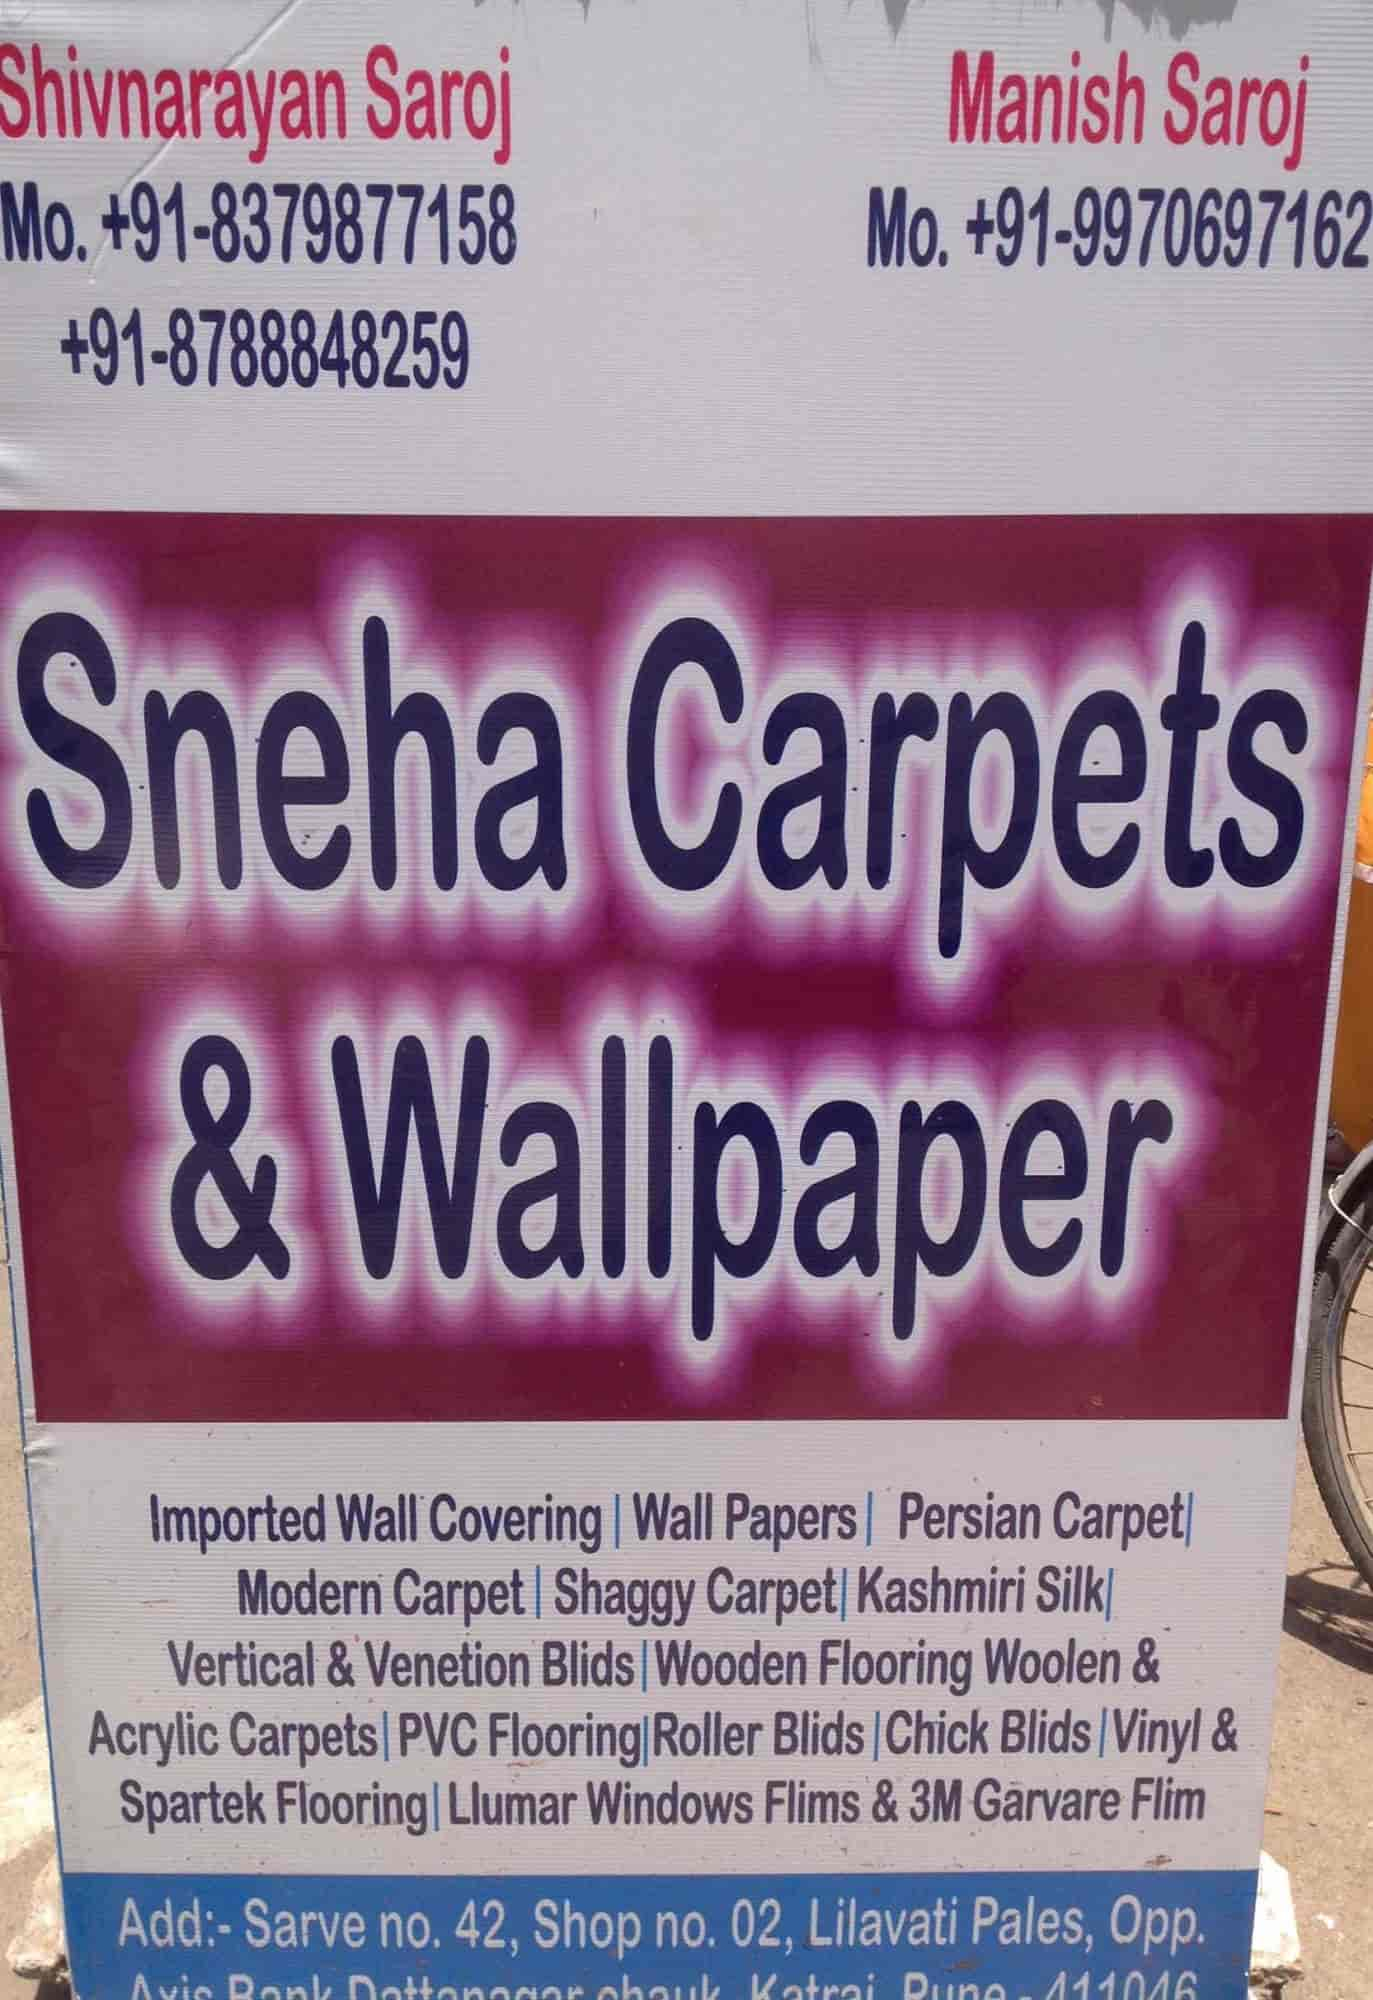 Sneha Carpets And Wallpaper Katraj Wall Paper Dealers In Pune Justdial